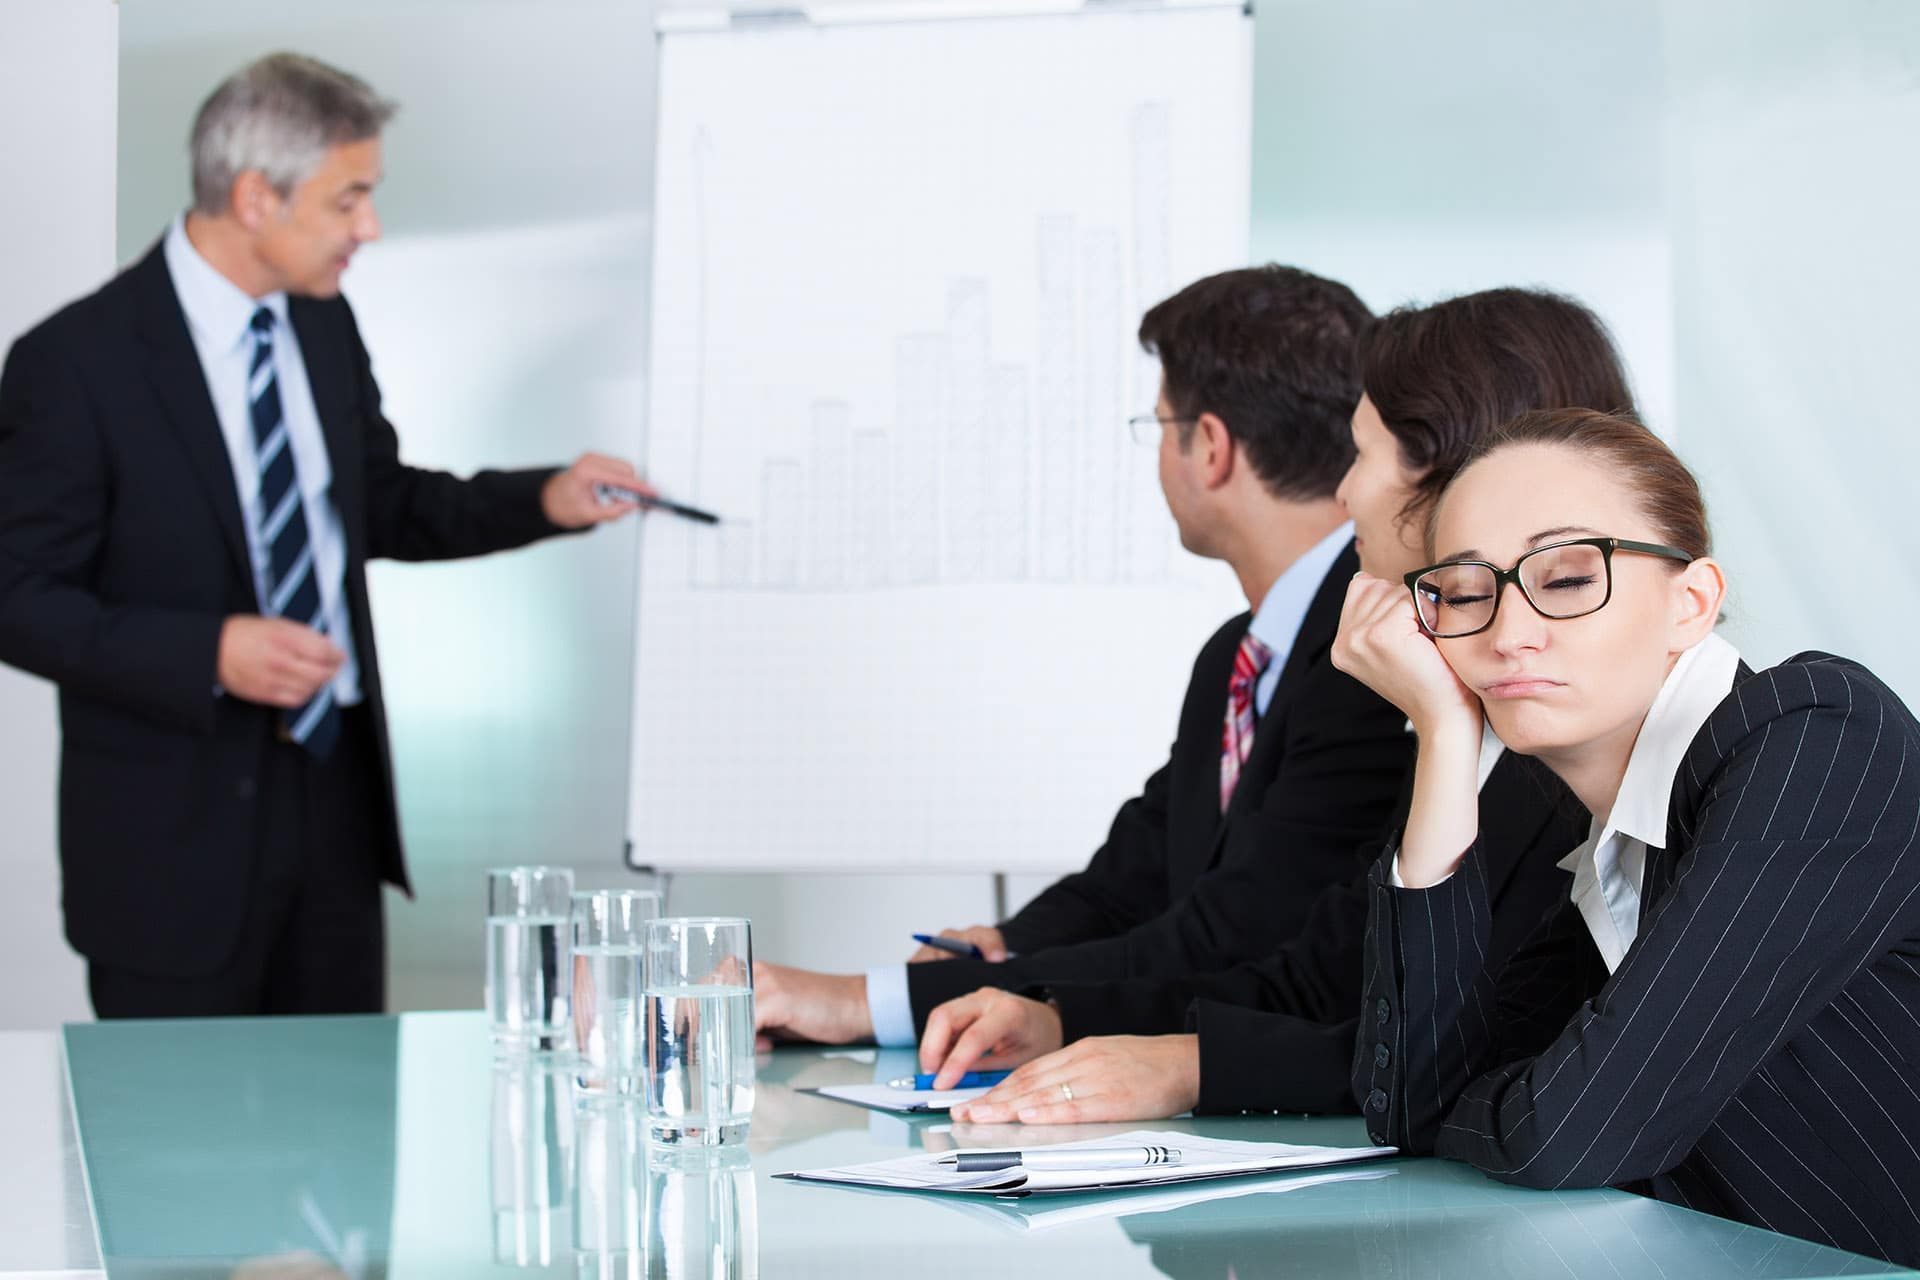 Woman Falling Asleep During a Presentation